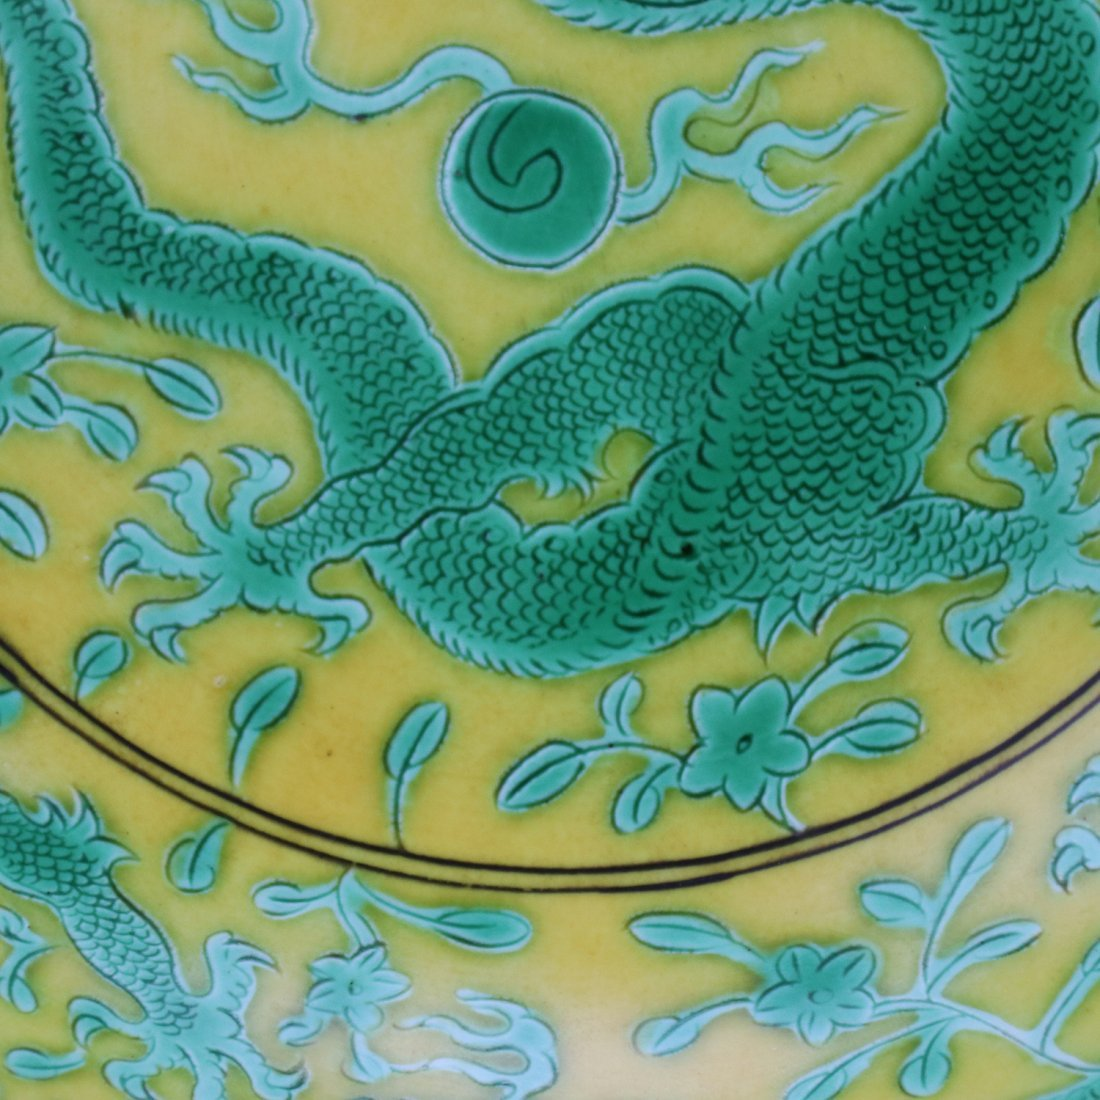 Chinese Yellow glaze green dragon Porcelain Plate - 2